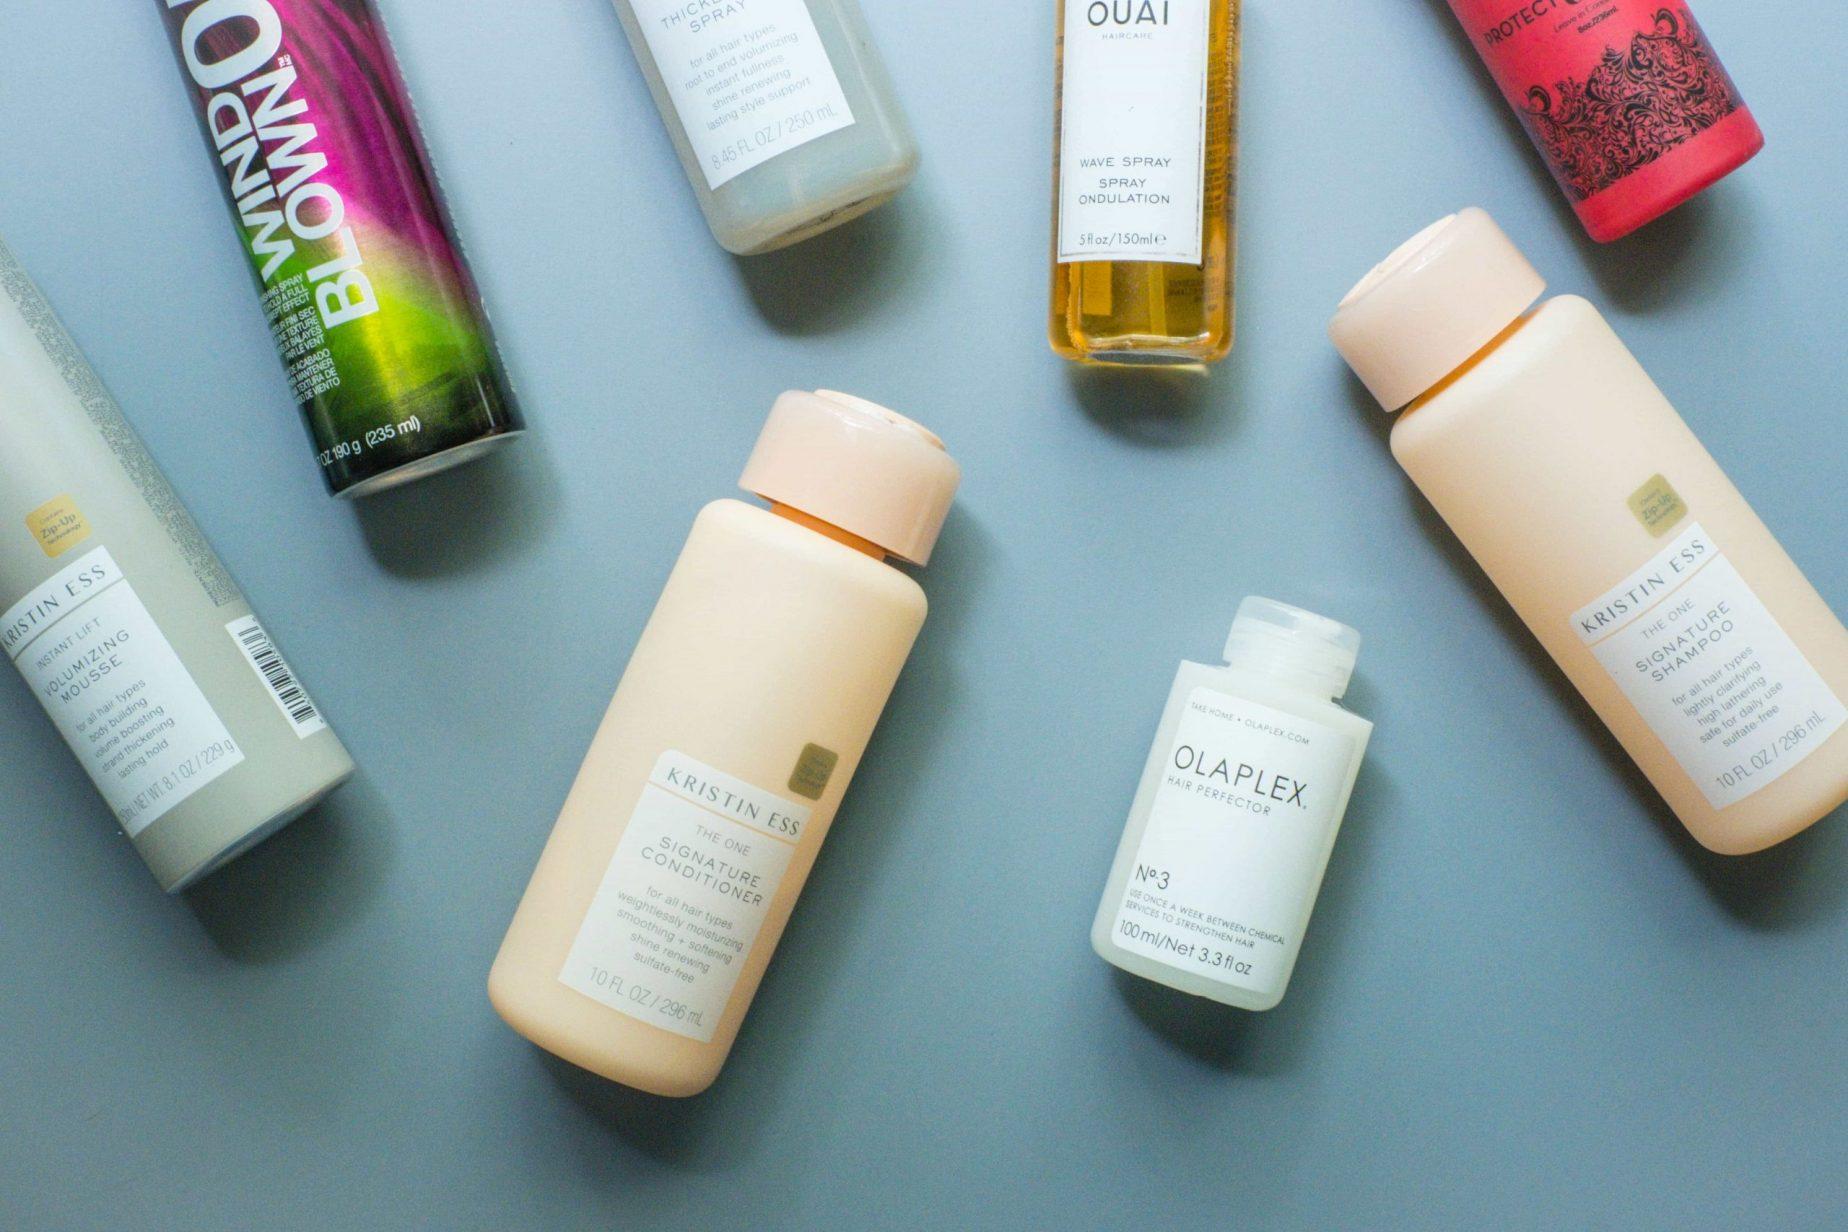 7 Hair Products I'll Keep Repurchasing #whatsavvysaid #ontheblog #wellness #lifestyle #haircare #beautyprotector #ouai #olaplex #redken #kristiness #healthyhair